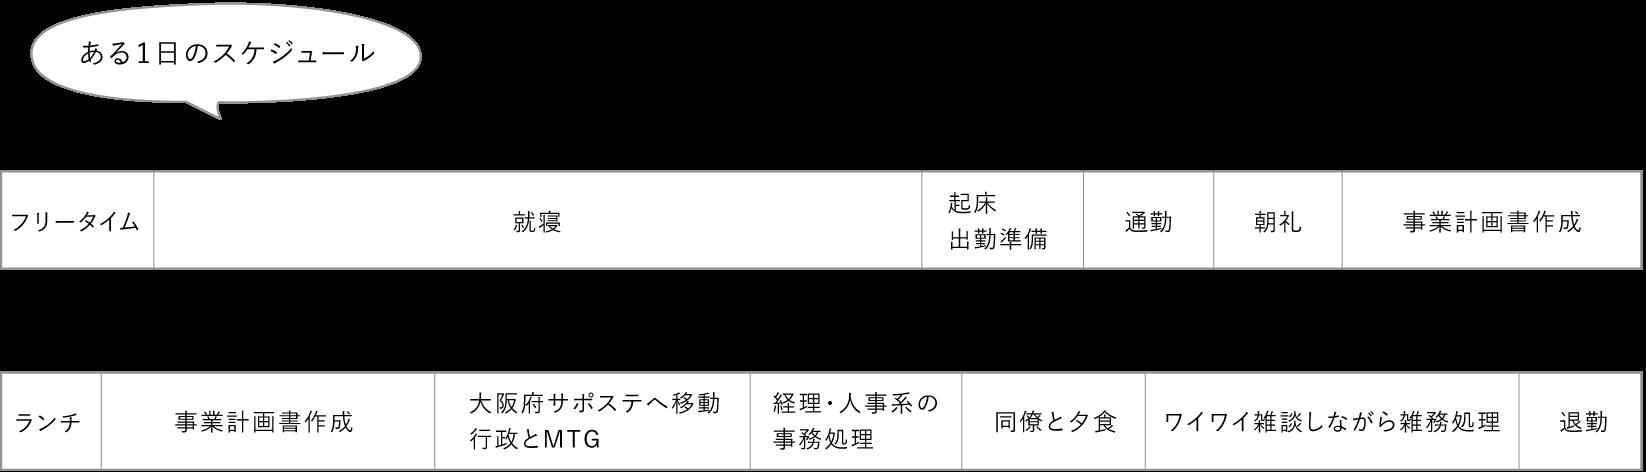 schedule02_furuichi